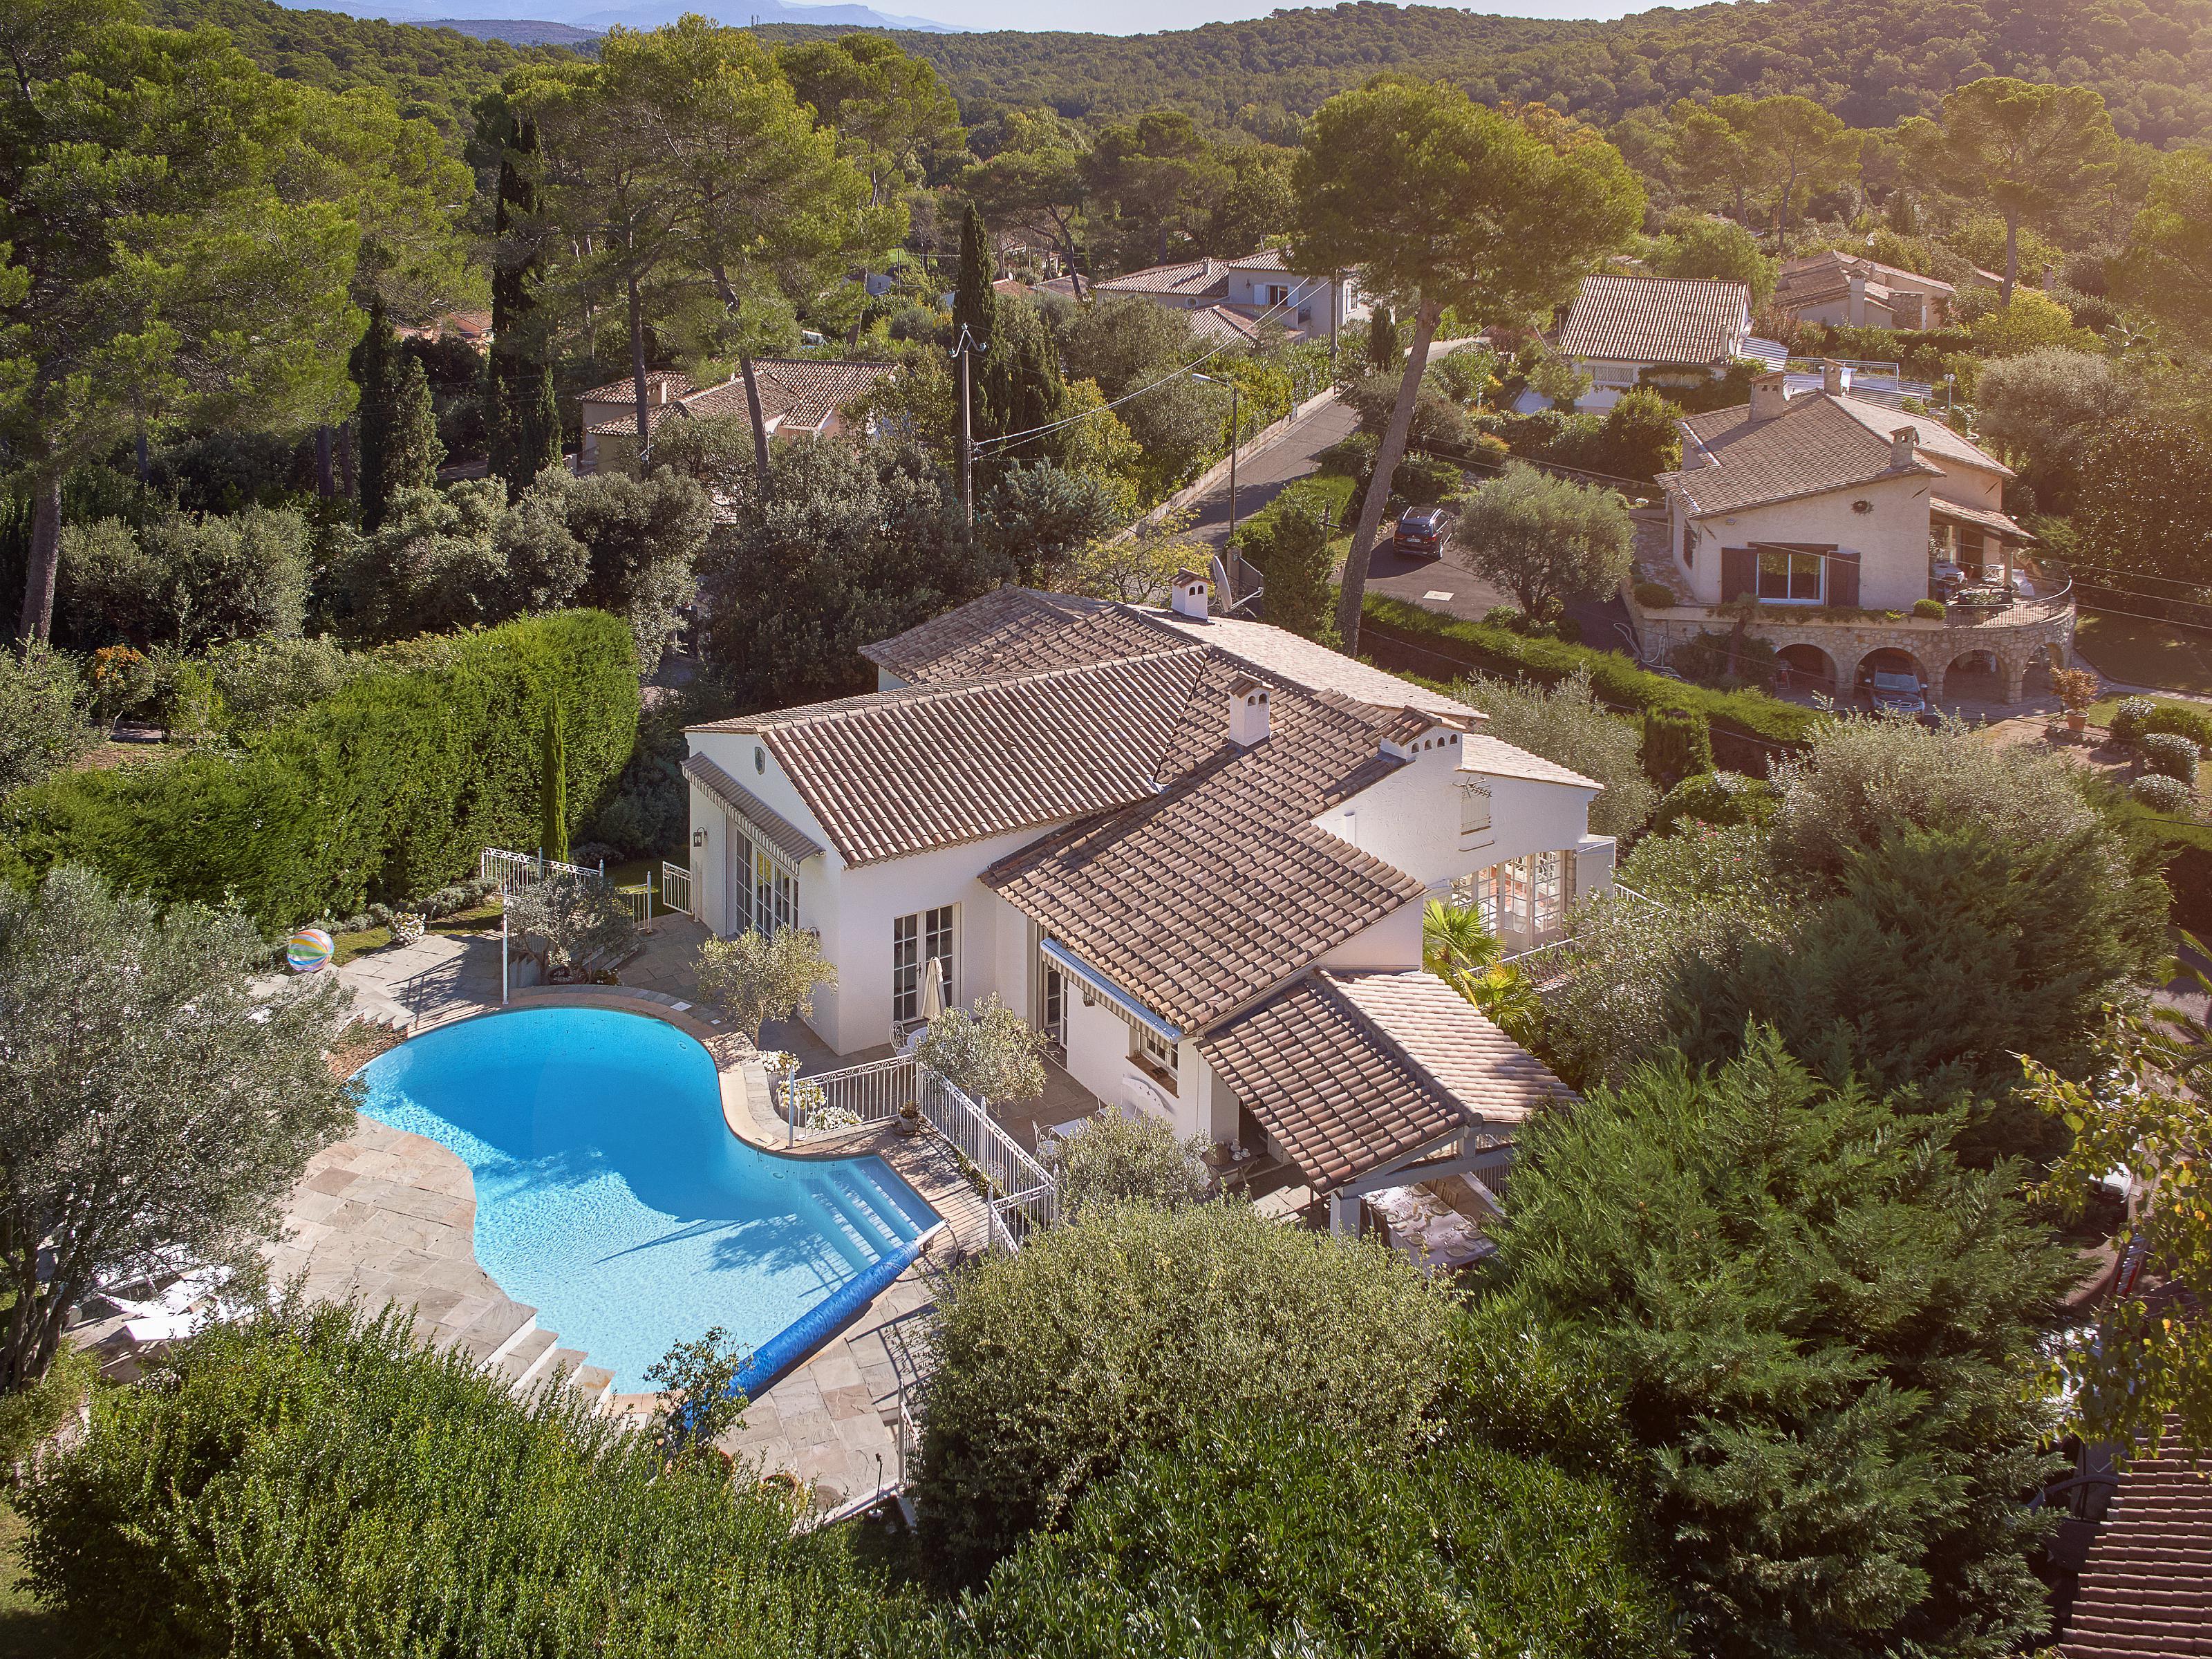 Villa per Vendita alle ore Private domain - Provençal style house Mougins Mougins, Provenza-Alpi-Costa Azzurra 06250 Francia